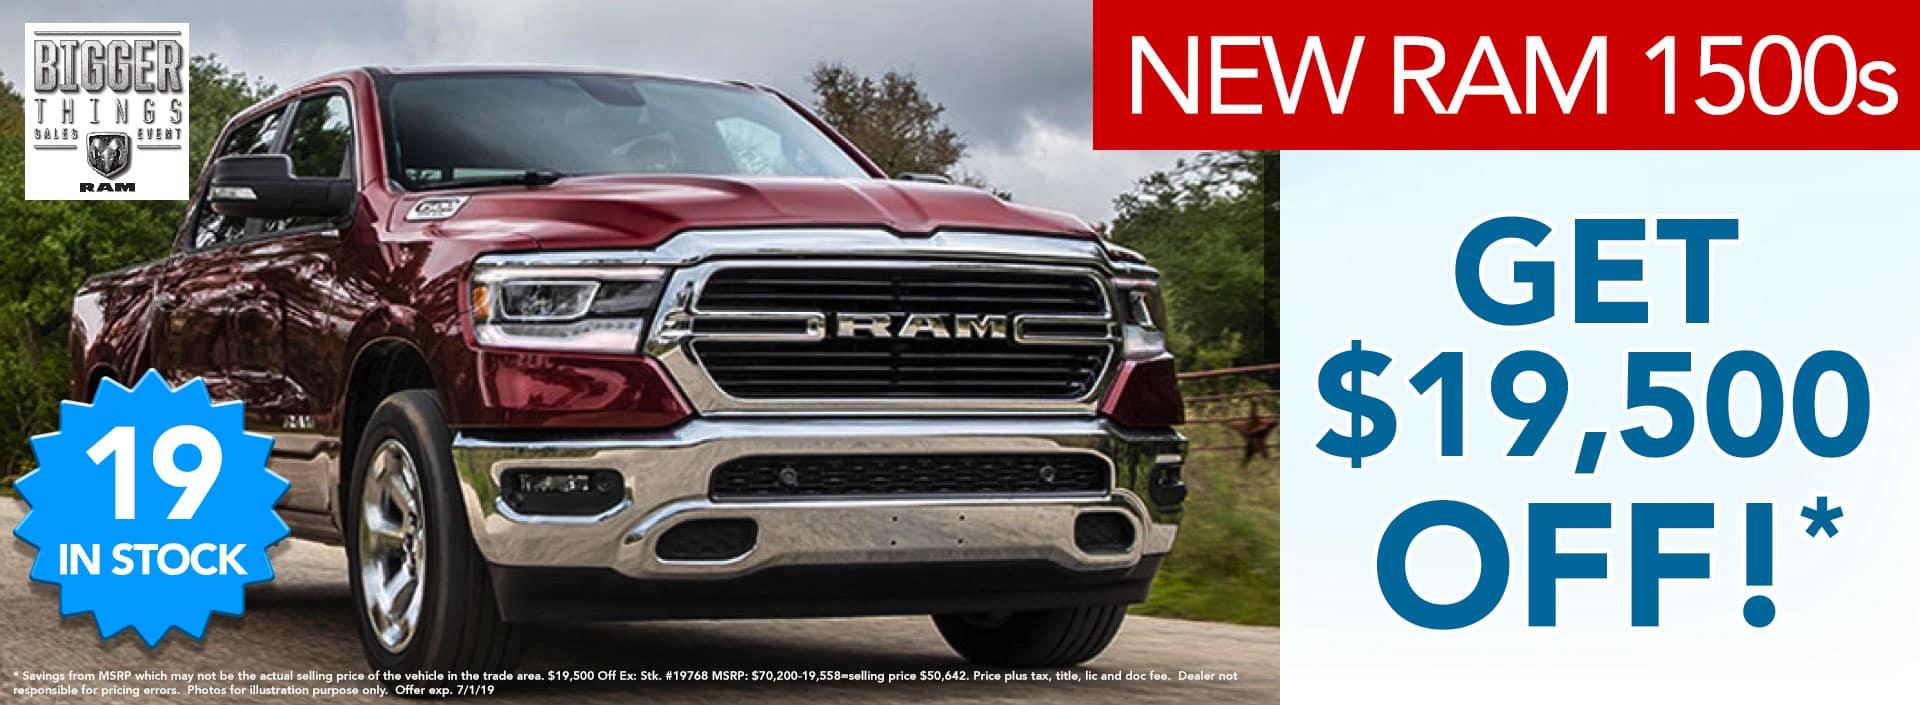 ram 1500 new